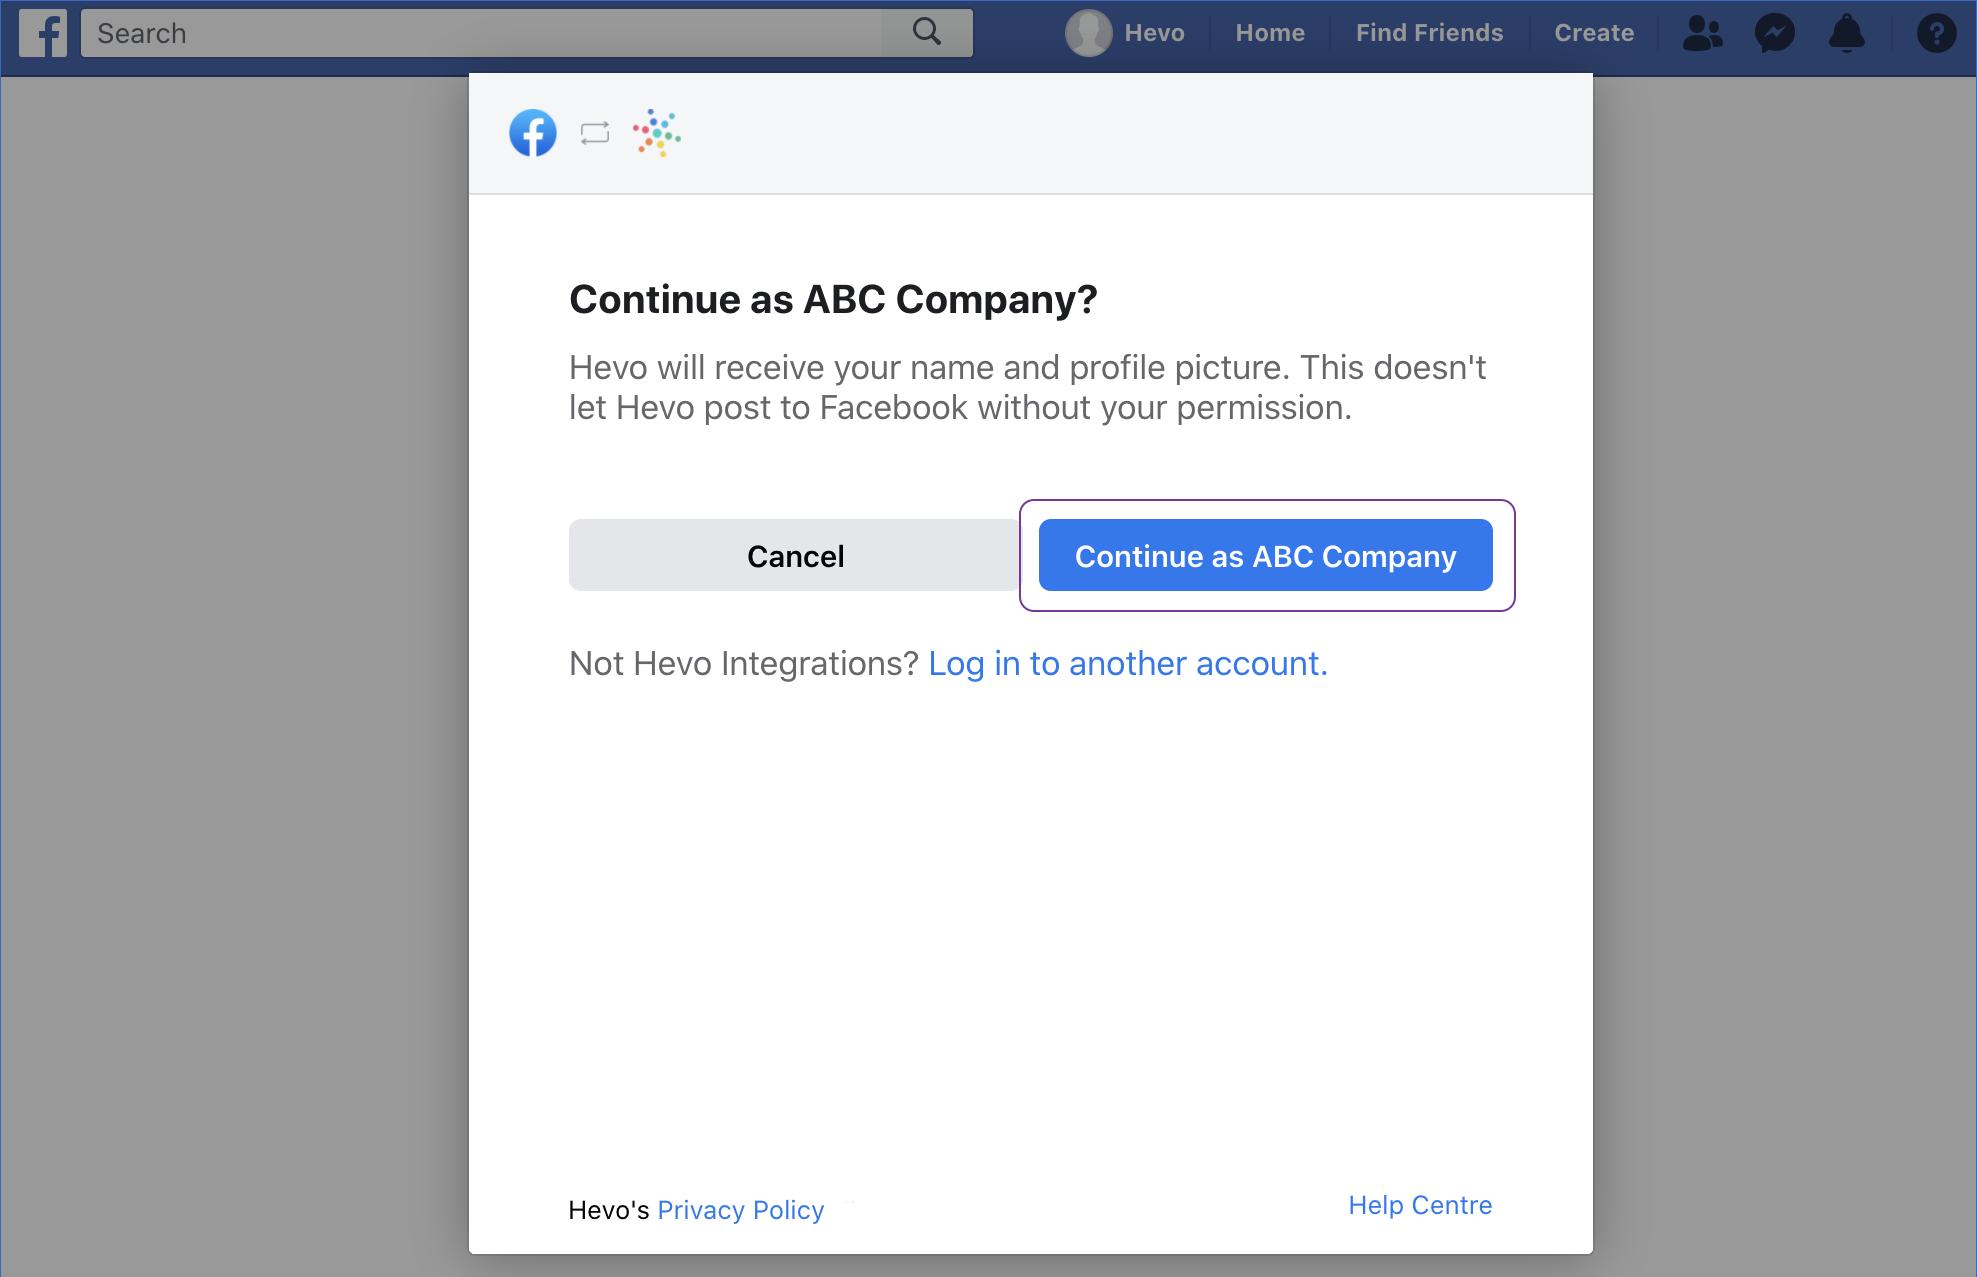 Continue as ABC Company